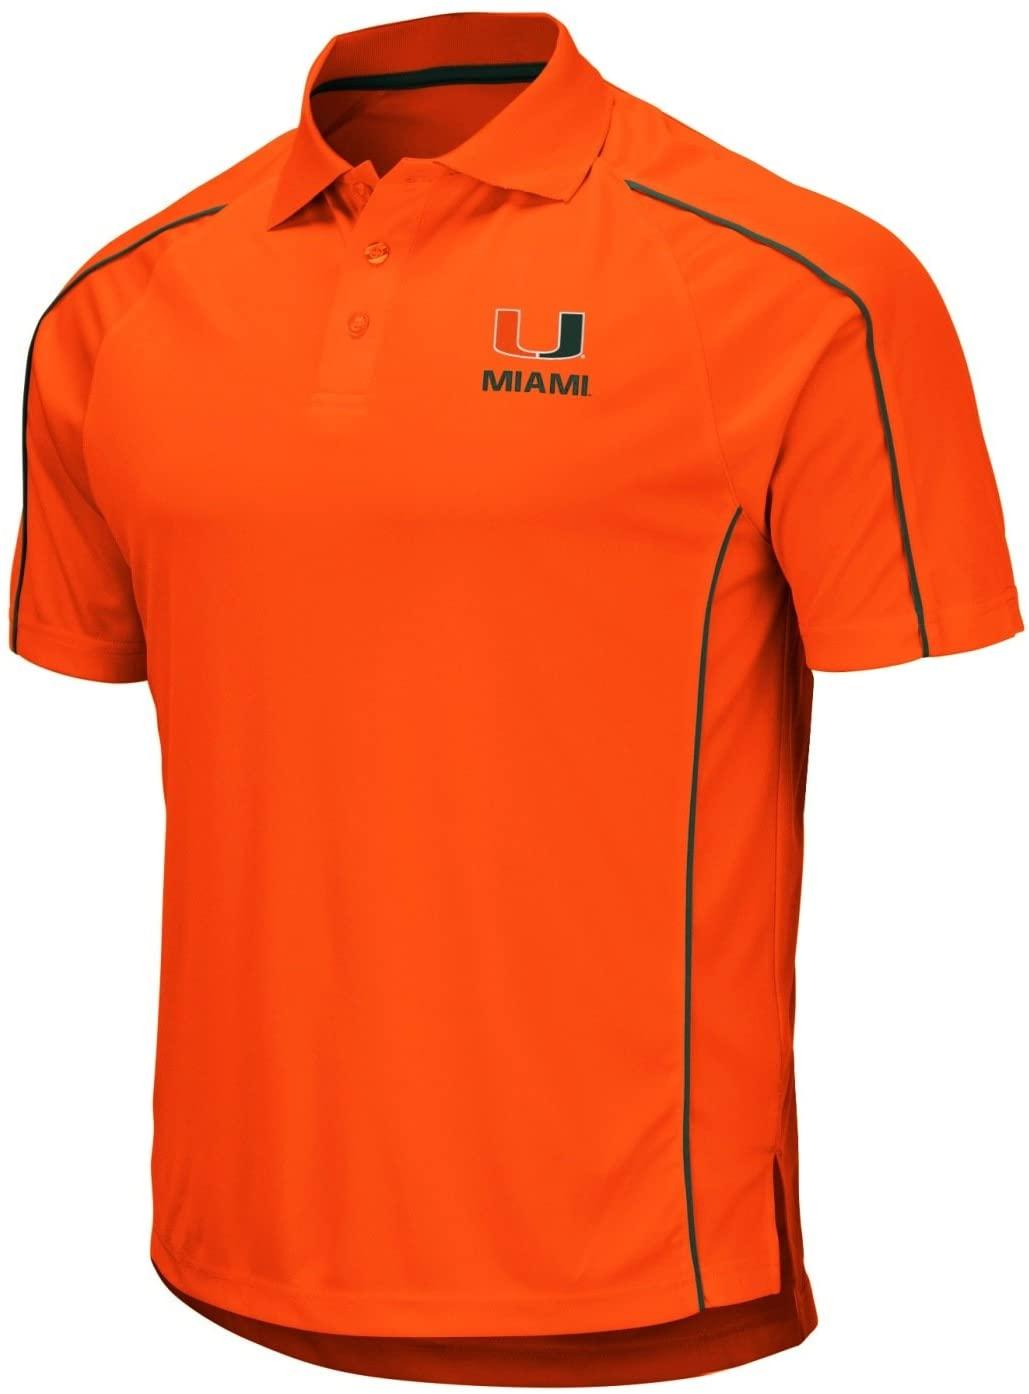 Stadium Athletics Miami Hurricanes NCAA Bunker Men's Performance Polo Shirt